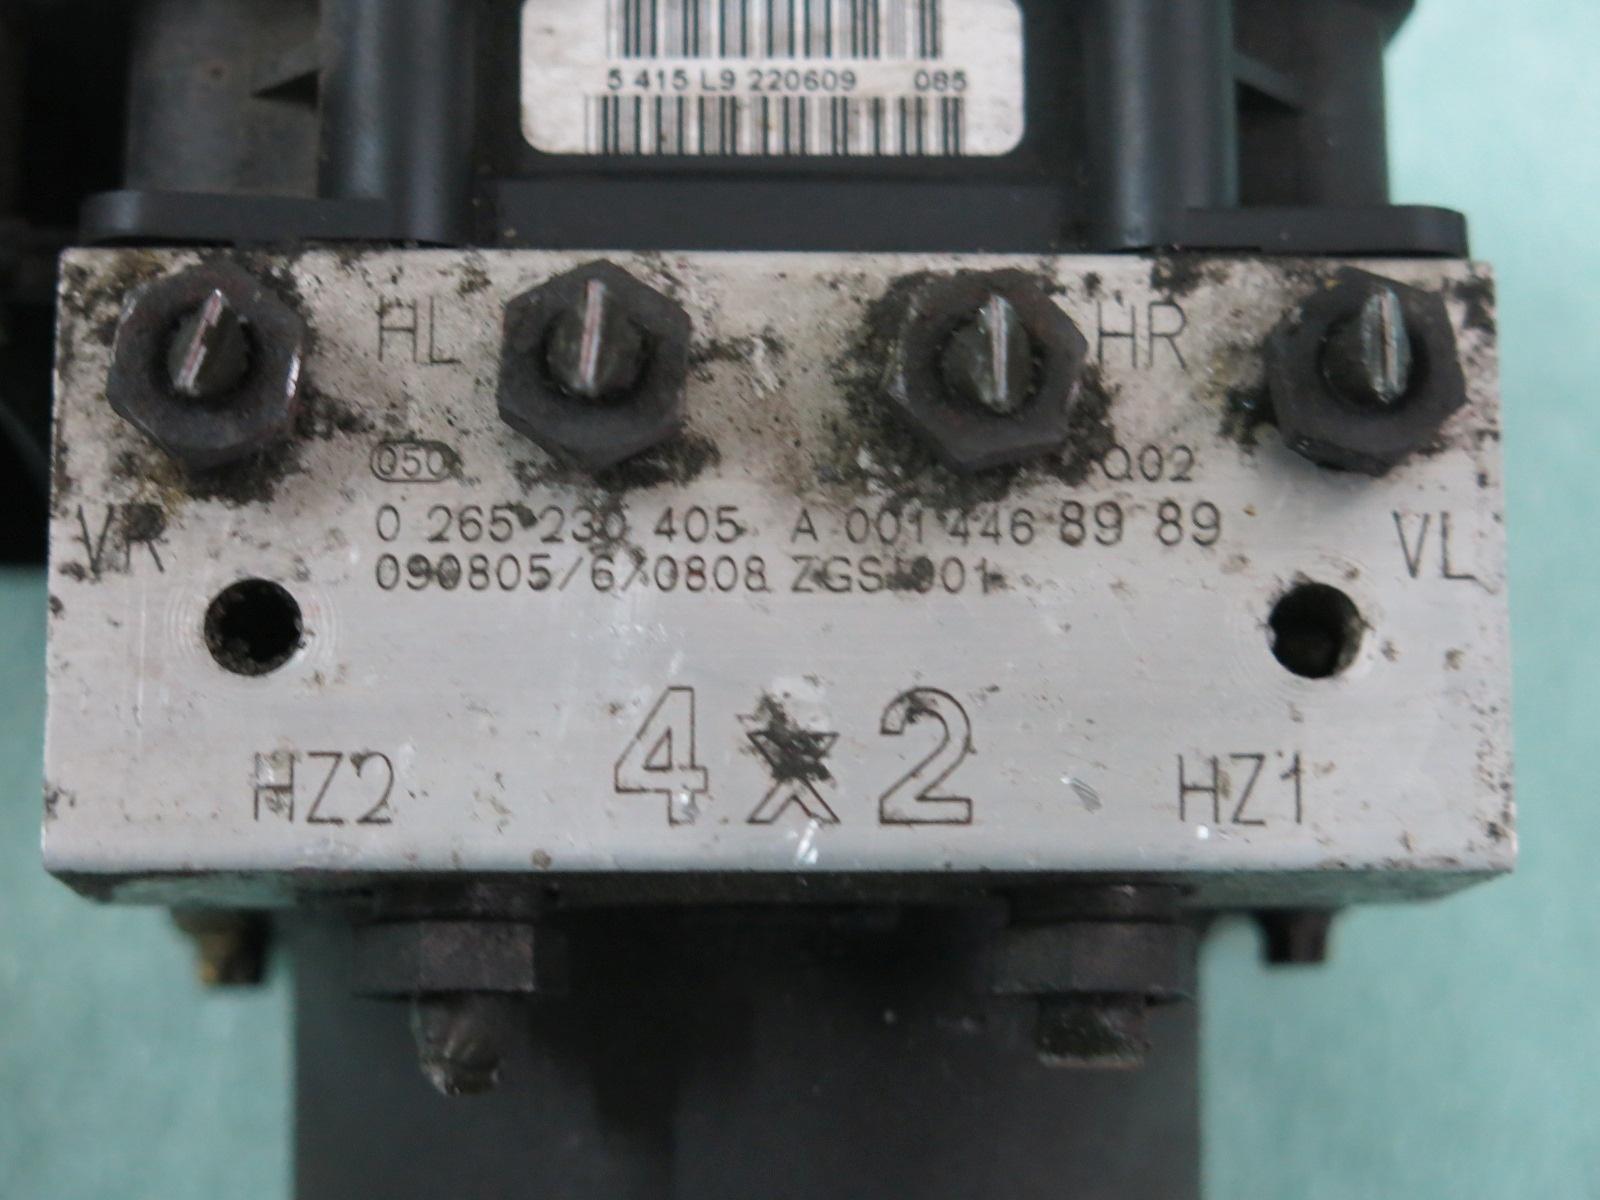 Mercedes ABS Module a0014462589 0265950481 001 446 25 89 026523503 1 de Express